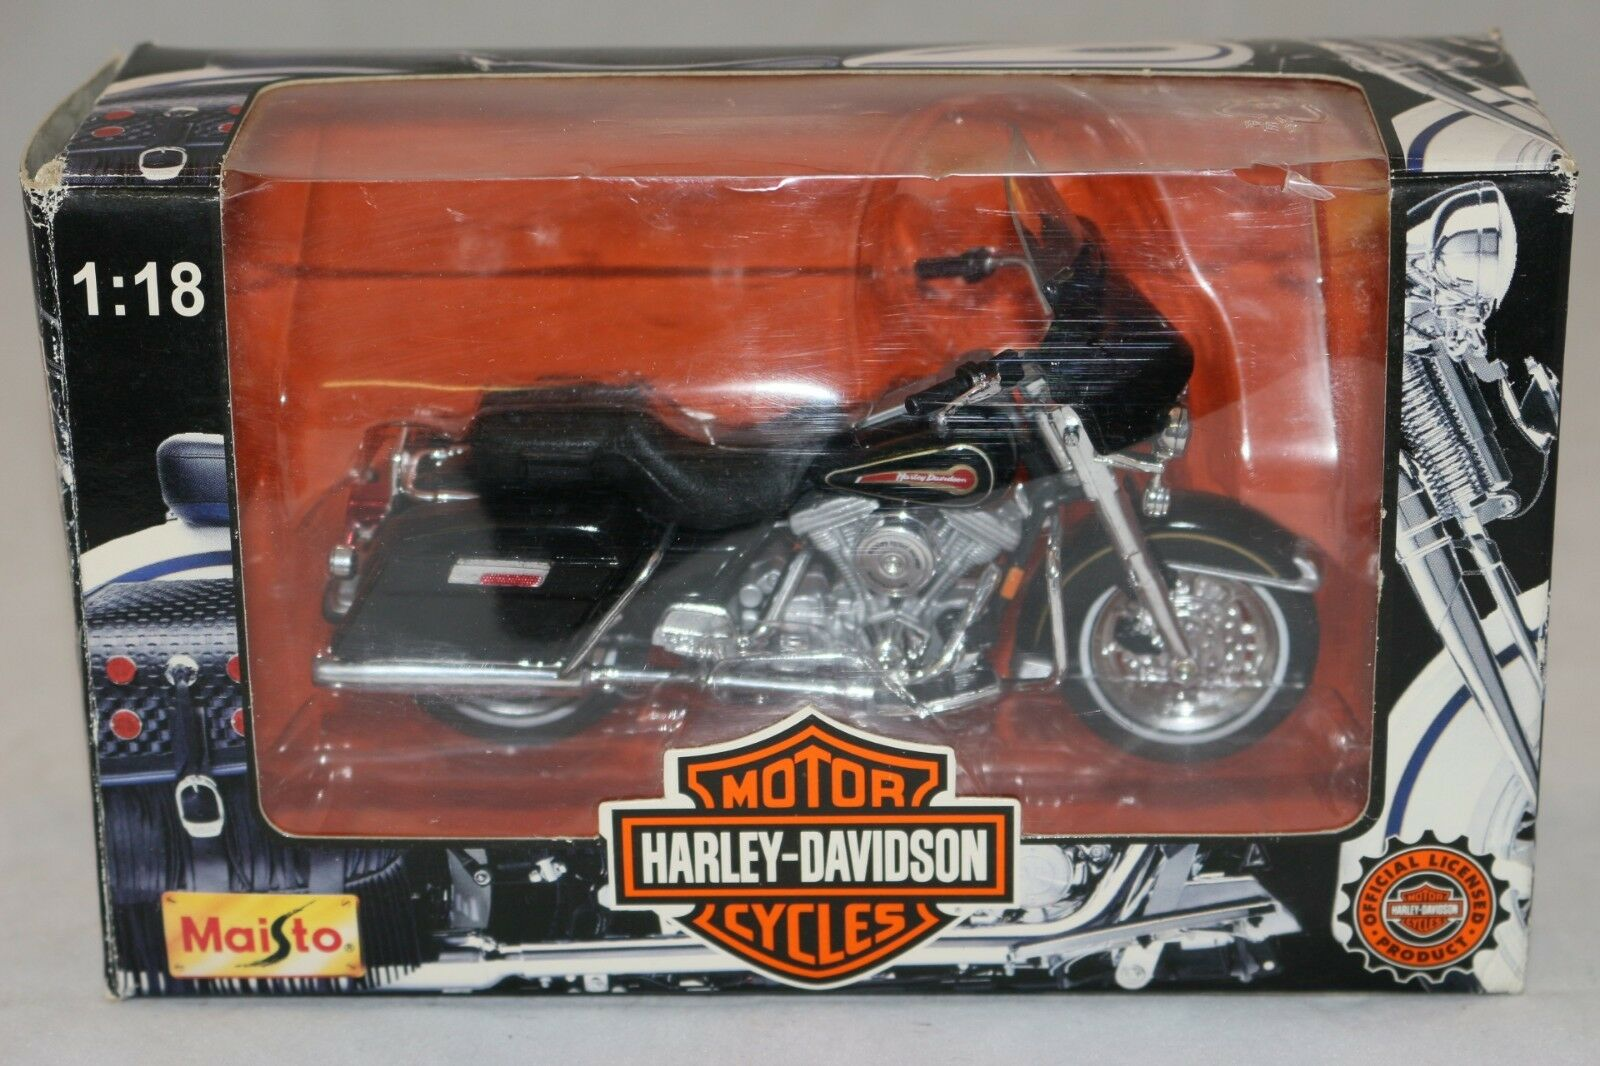 MAISTO moto 1 18 HARLEY-DAVIDSON FLHT ELECTRA GLIDE STANDARD + boite ,état neuf